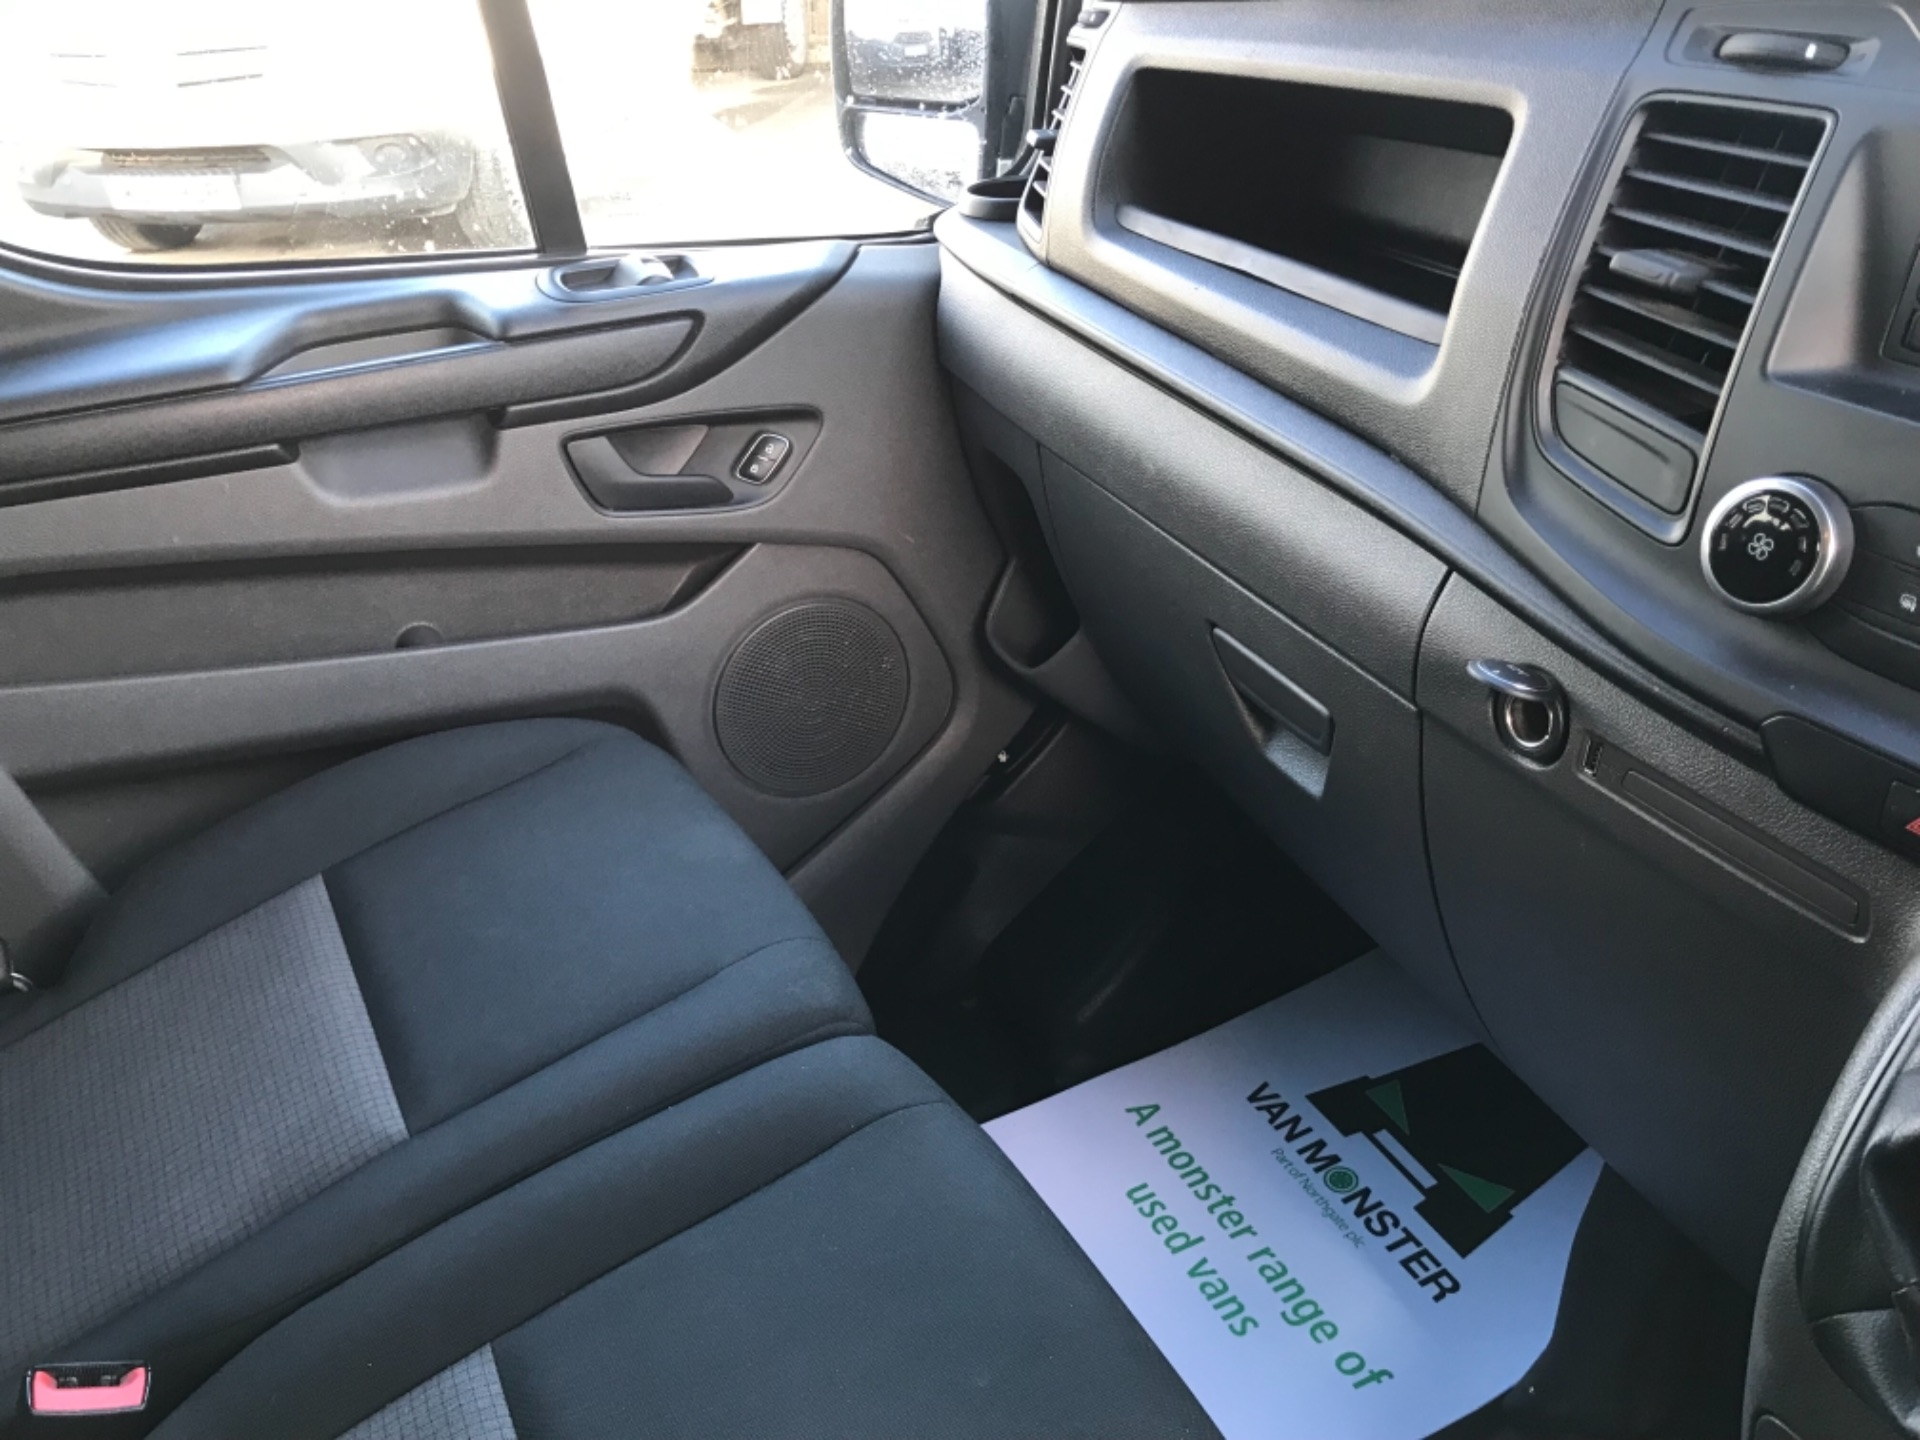 2018 Ford Transit Custom 320 L2 2.0 130ps D/Cab Euro 6 (BK18OLG) Image 9